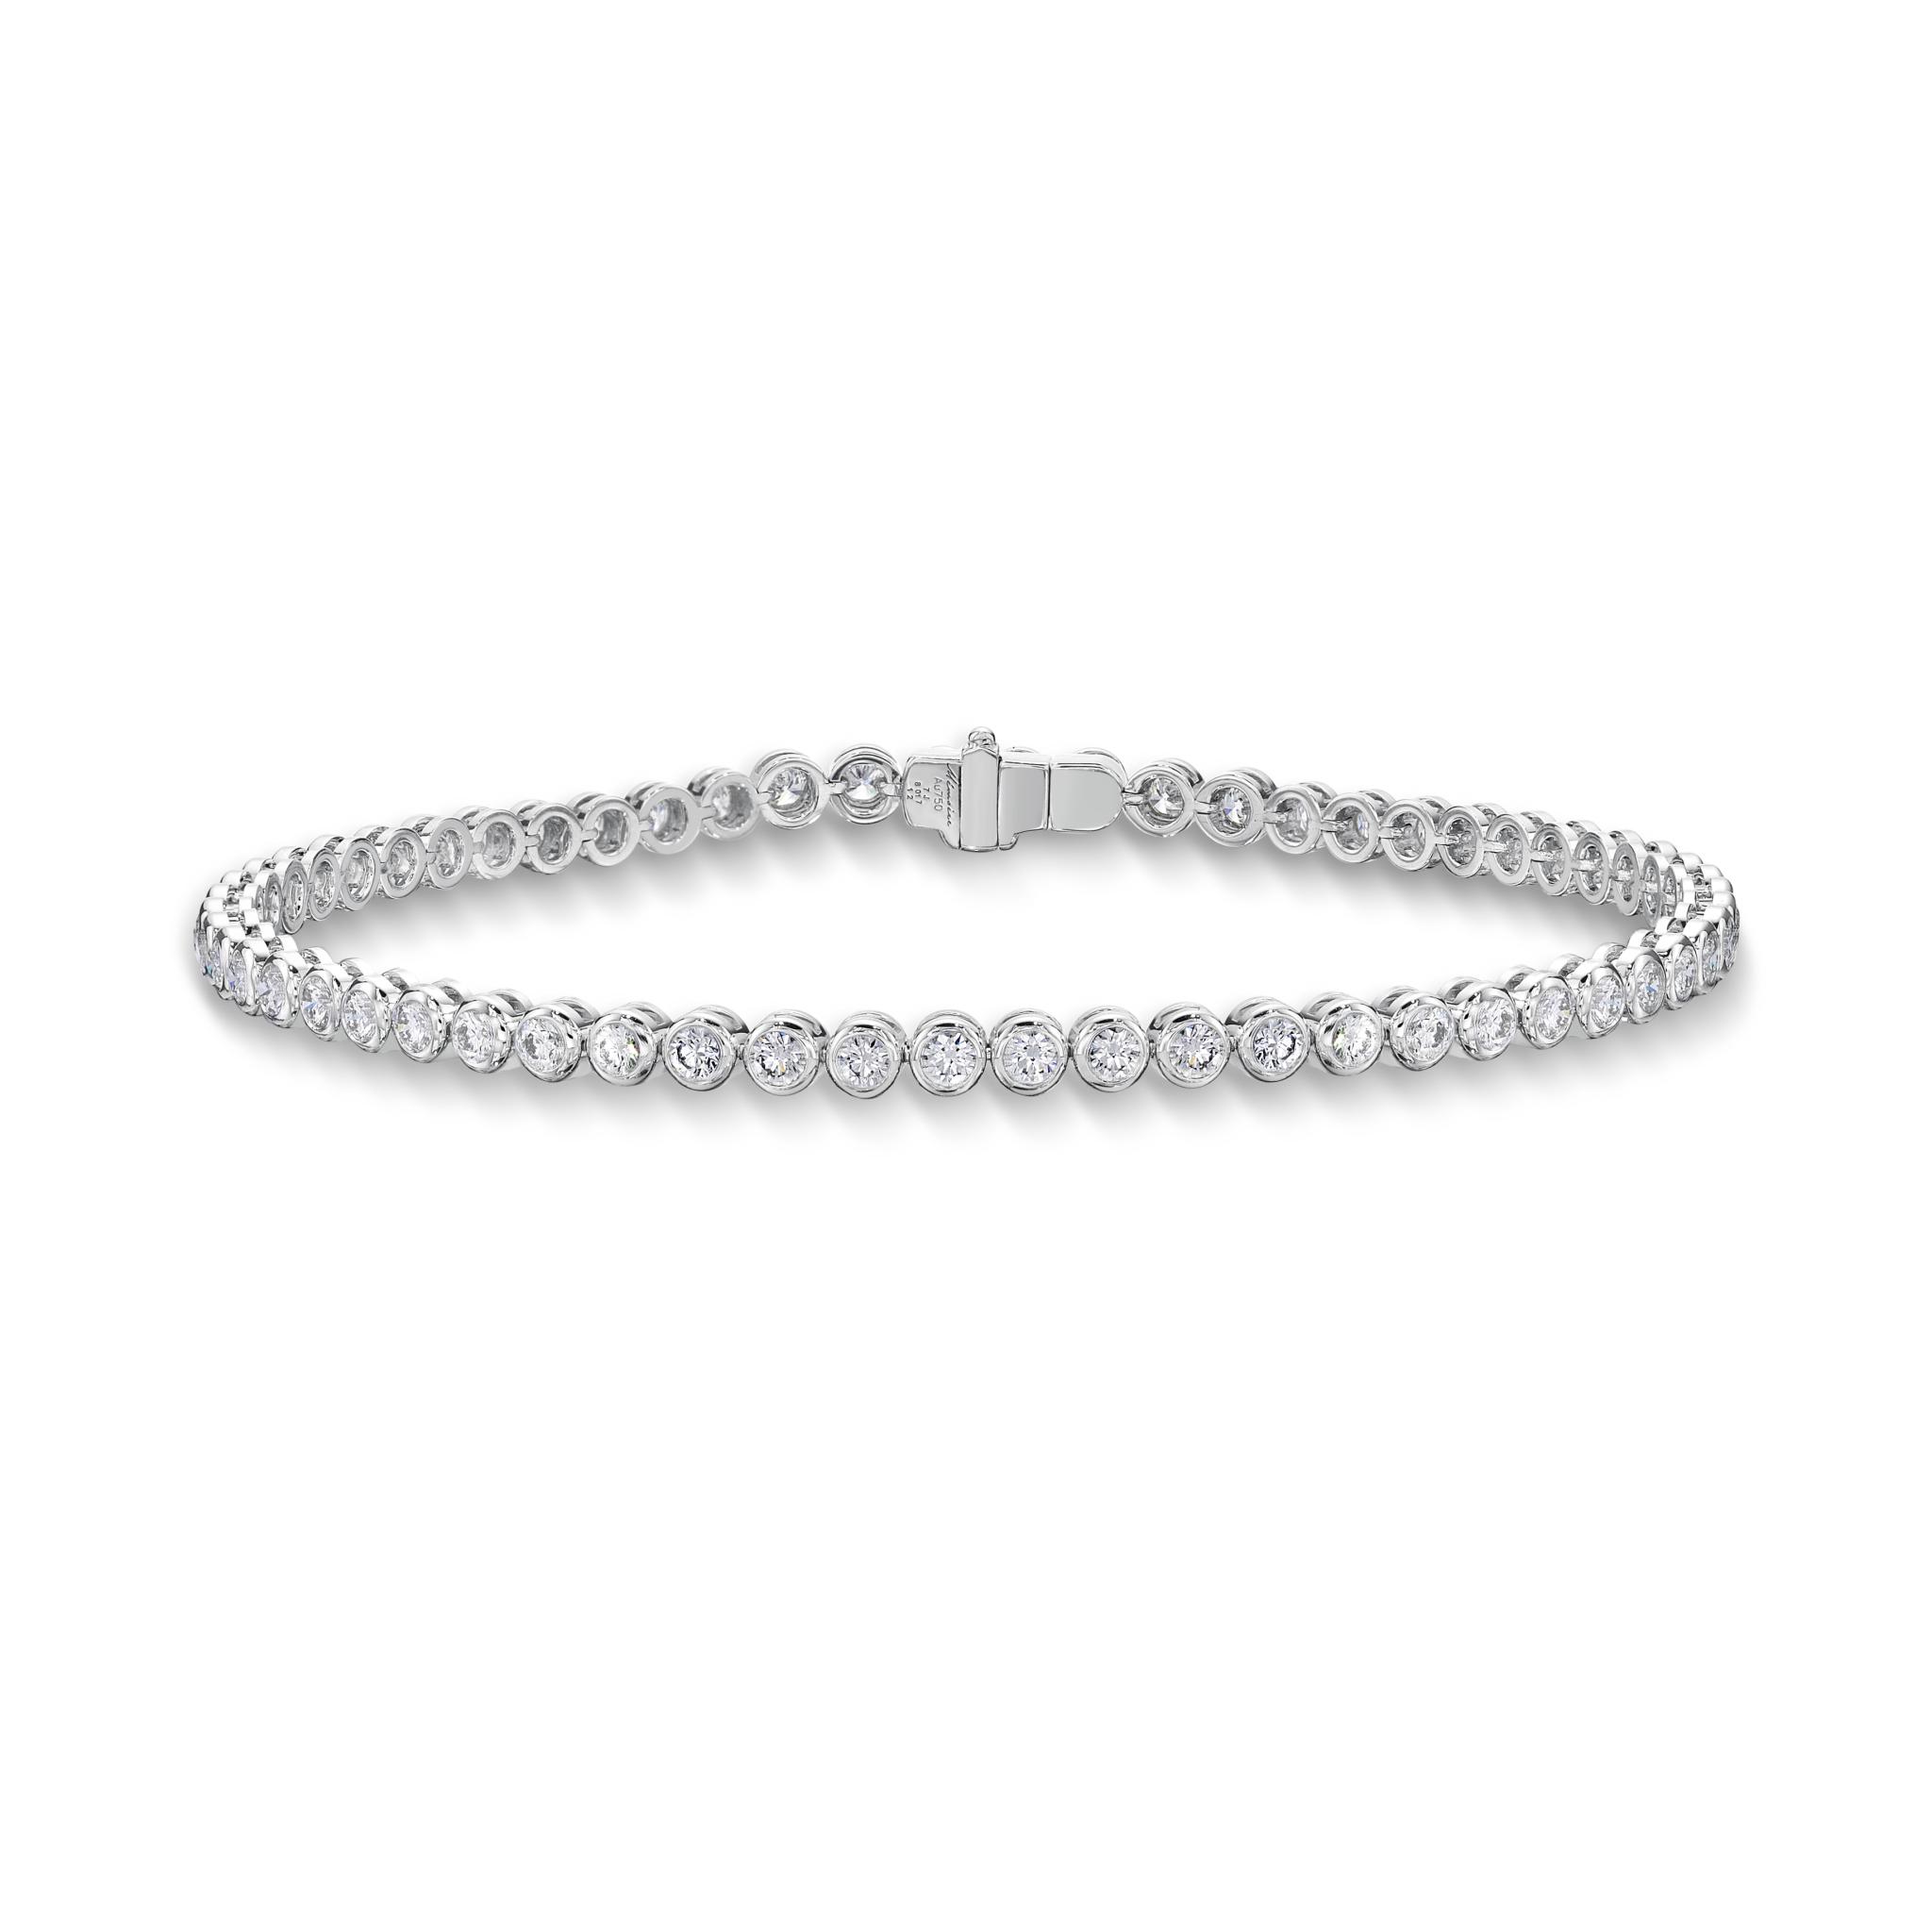 Memoire 18ct White Gold 1.50 Carat Diamond Bezal Tennis Bracelet